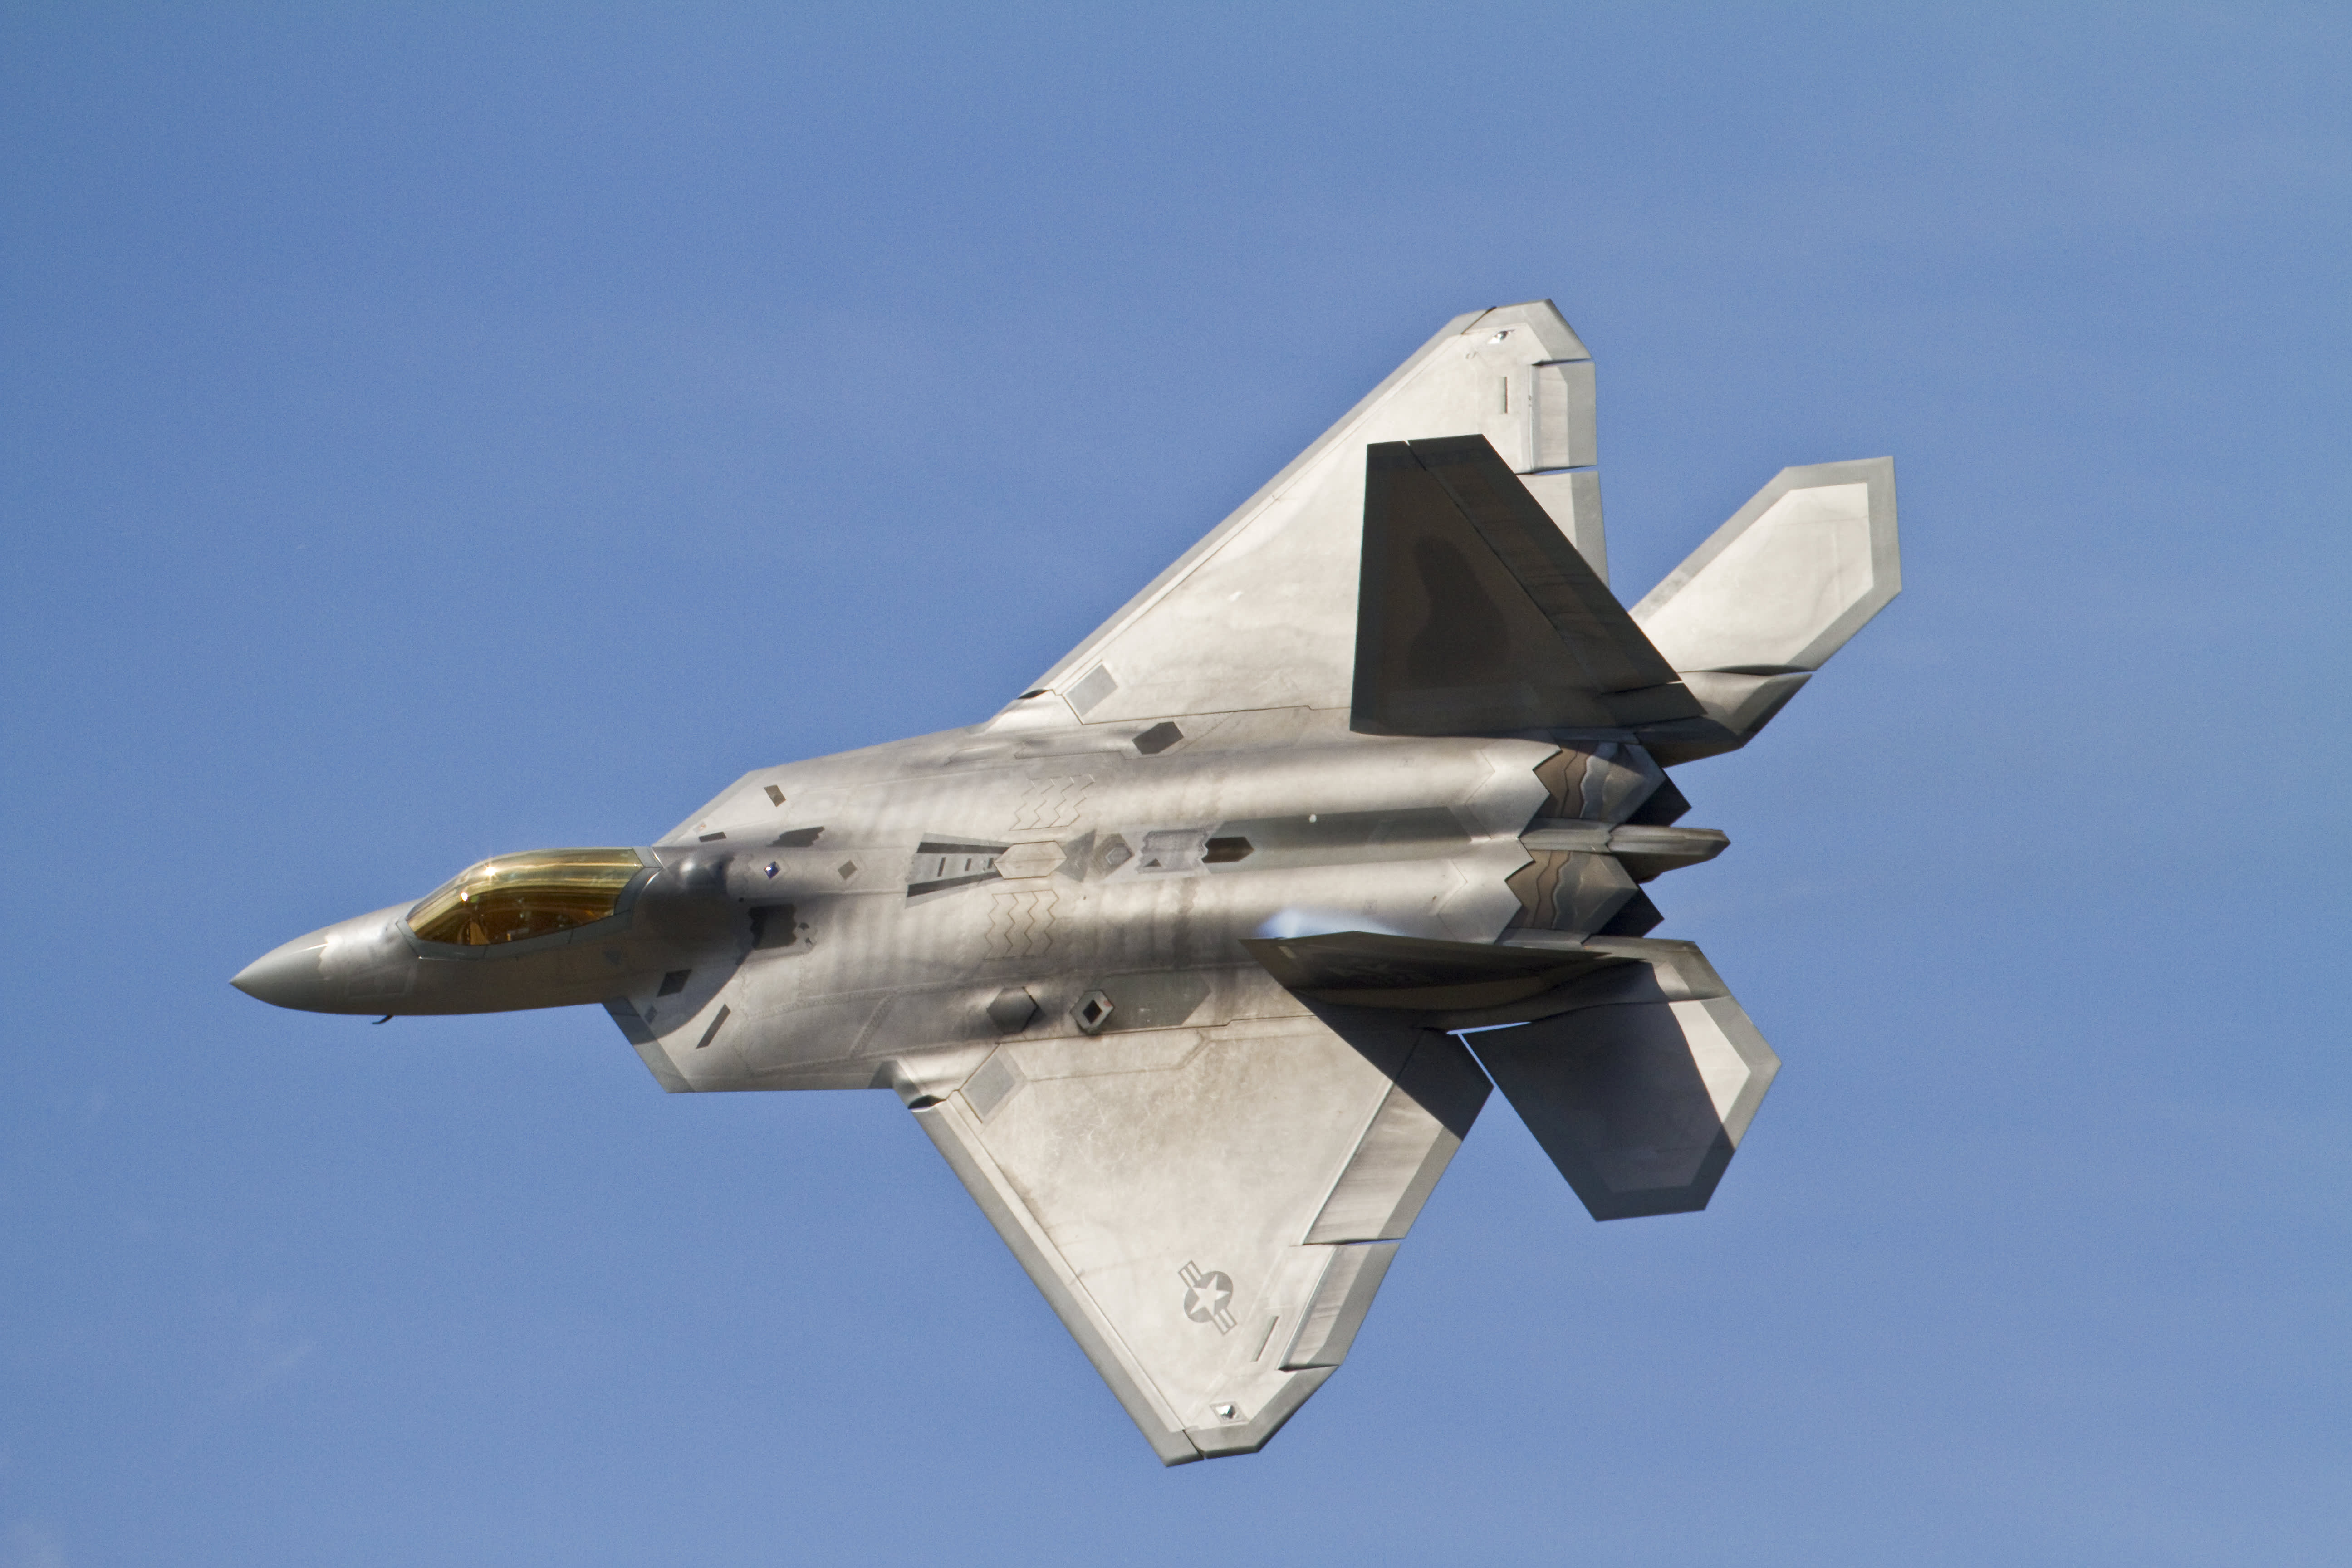 Why Lockheed Martin gets billions in taxpayer money each year